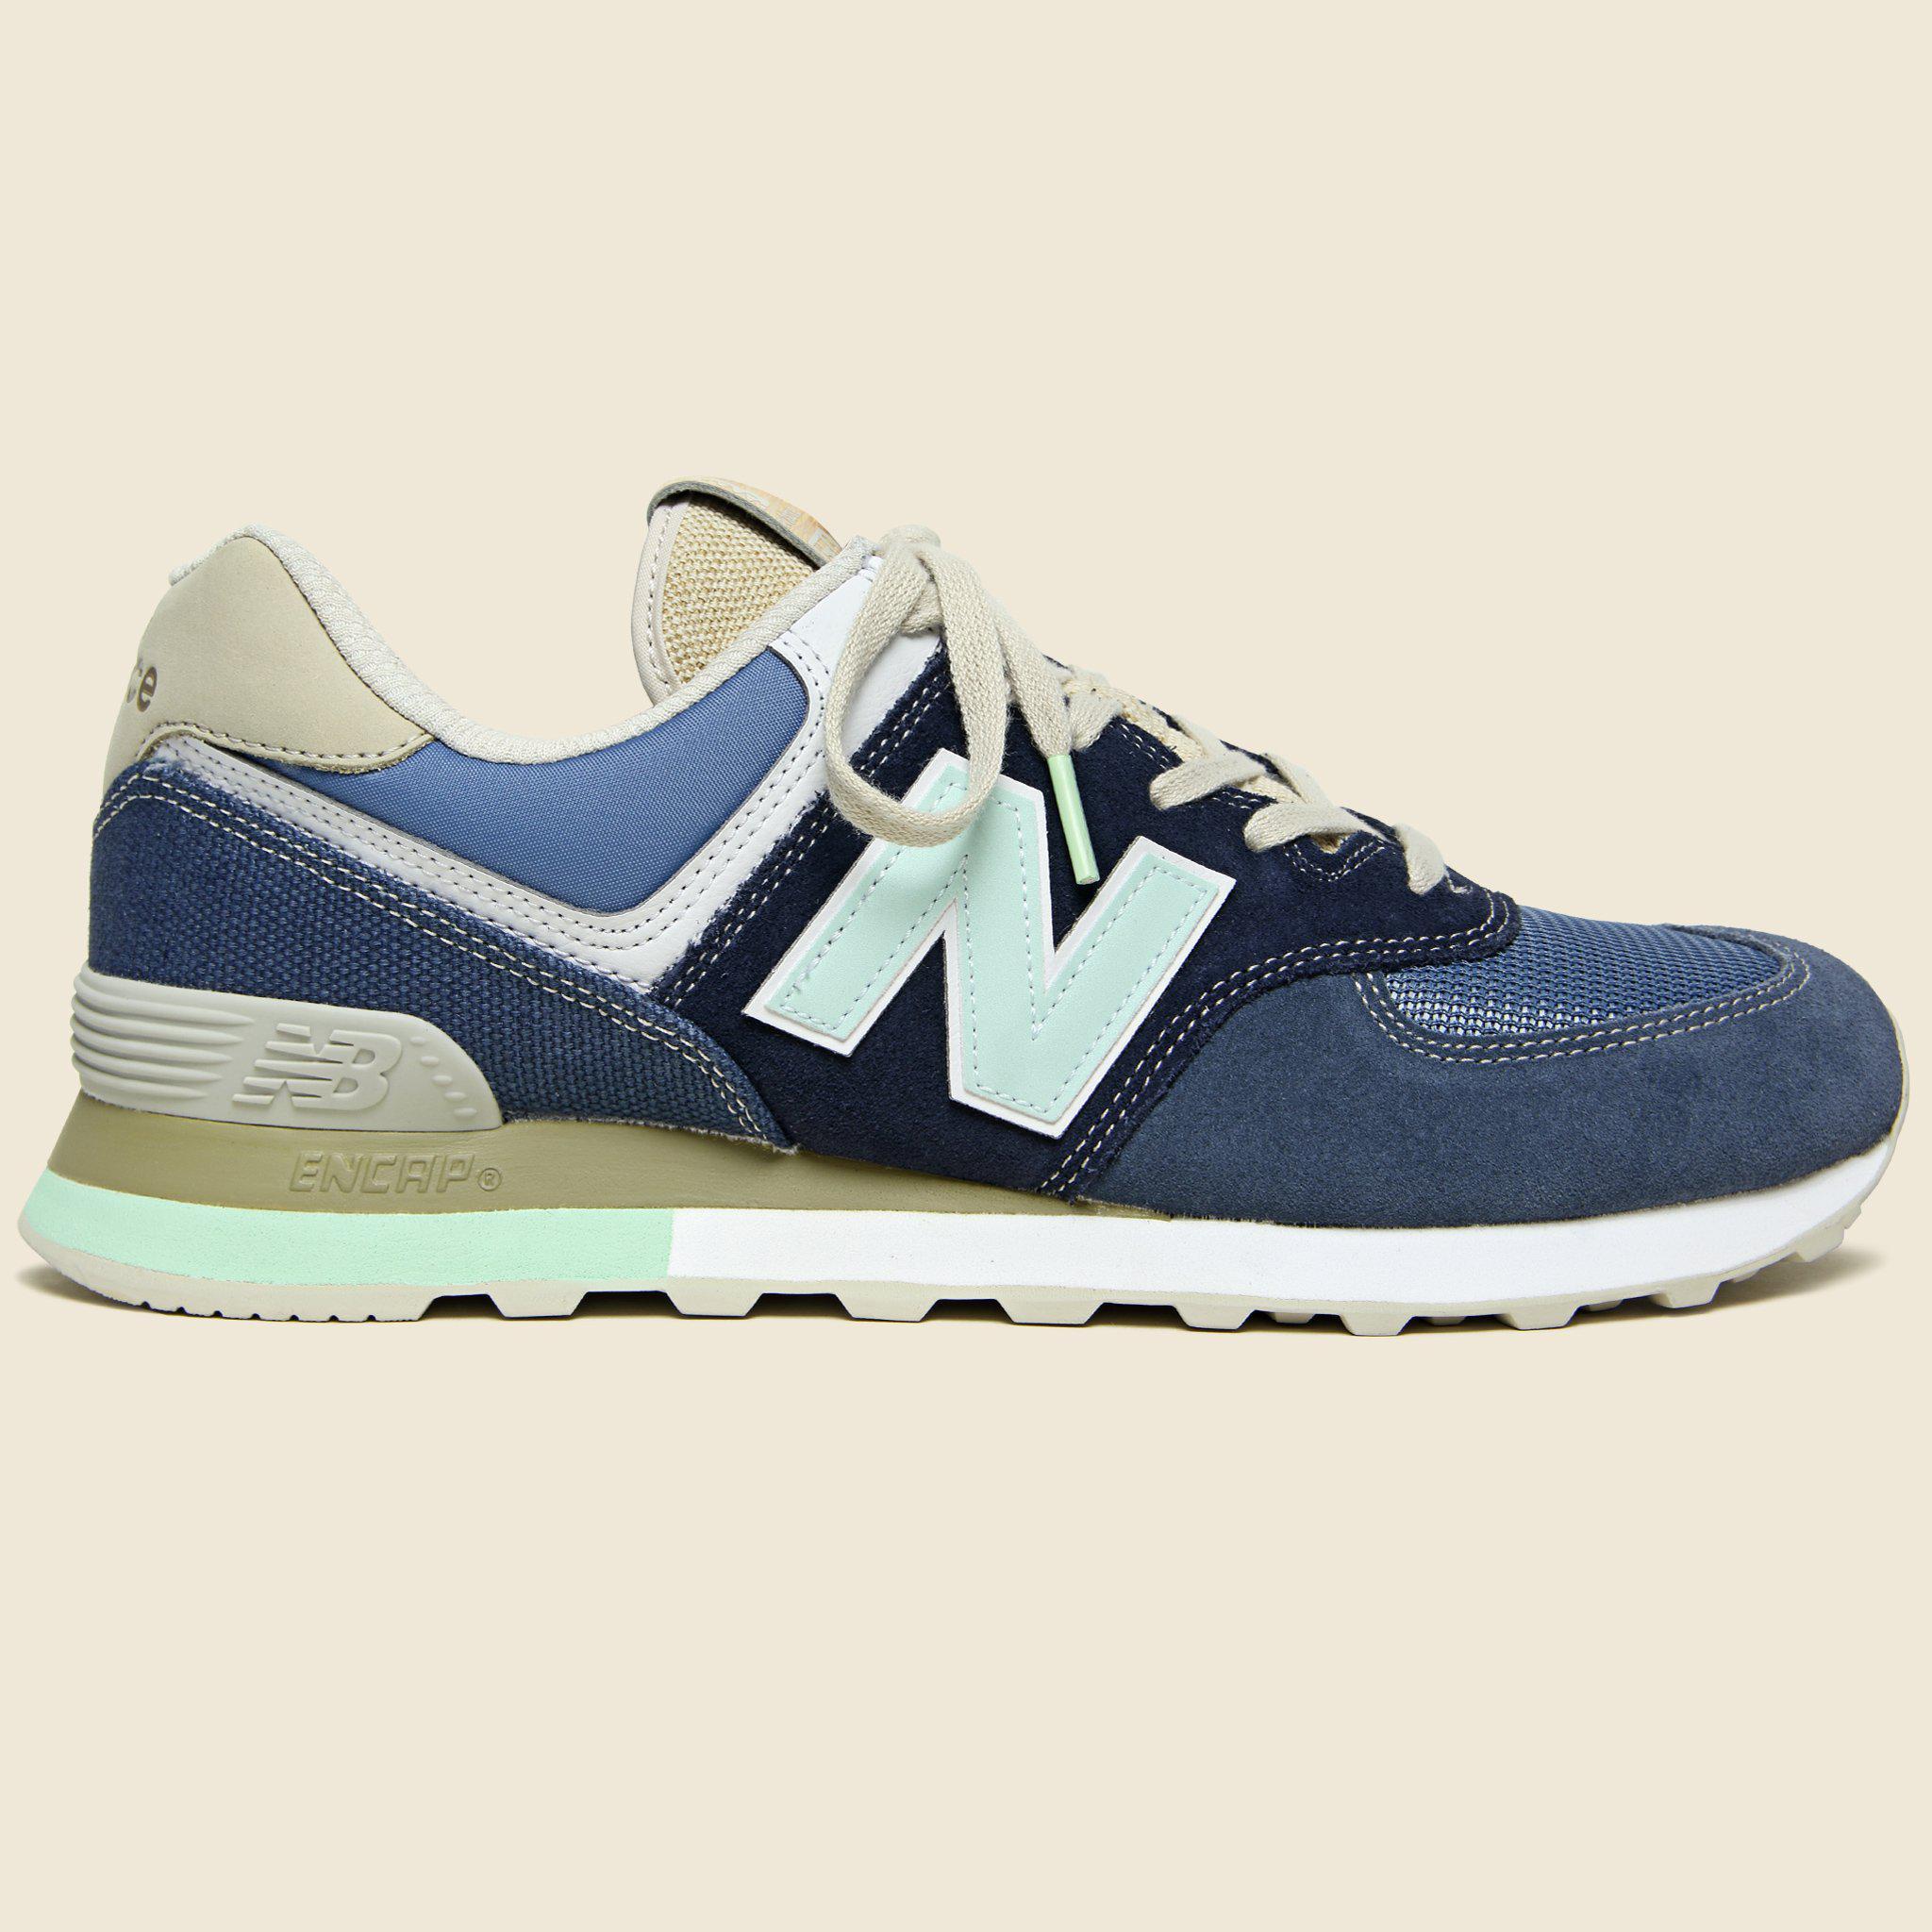 New Balance Blue Retro Surf 574 Sneaker Navyindigo for men